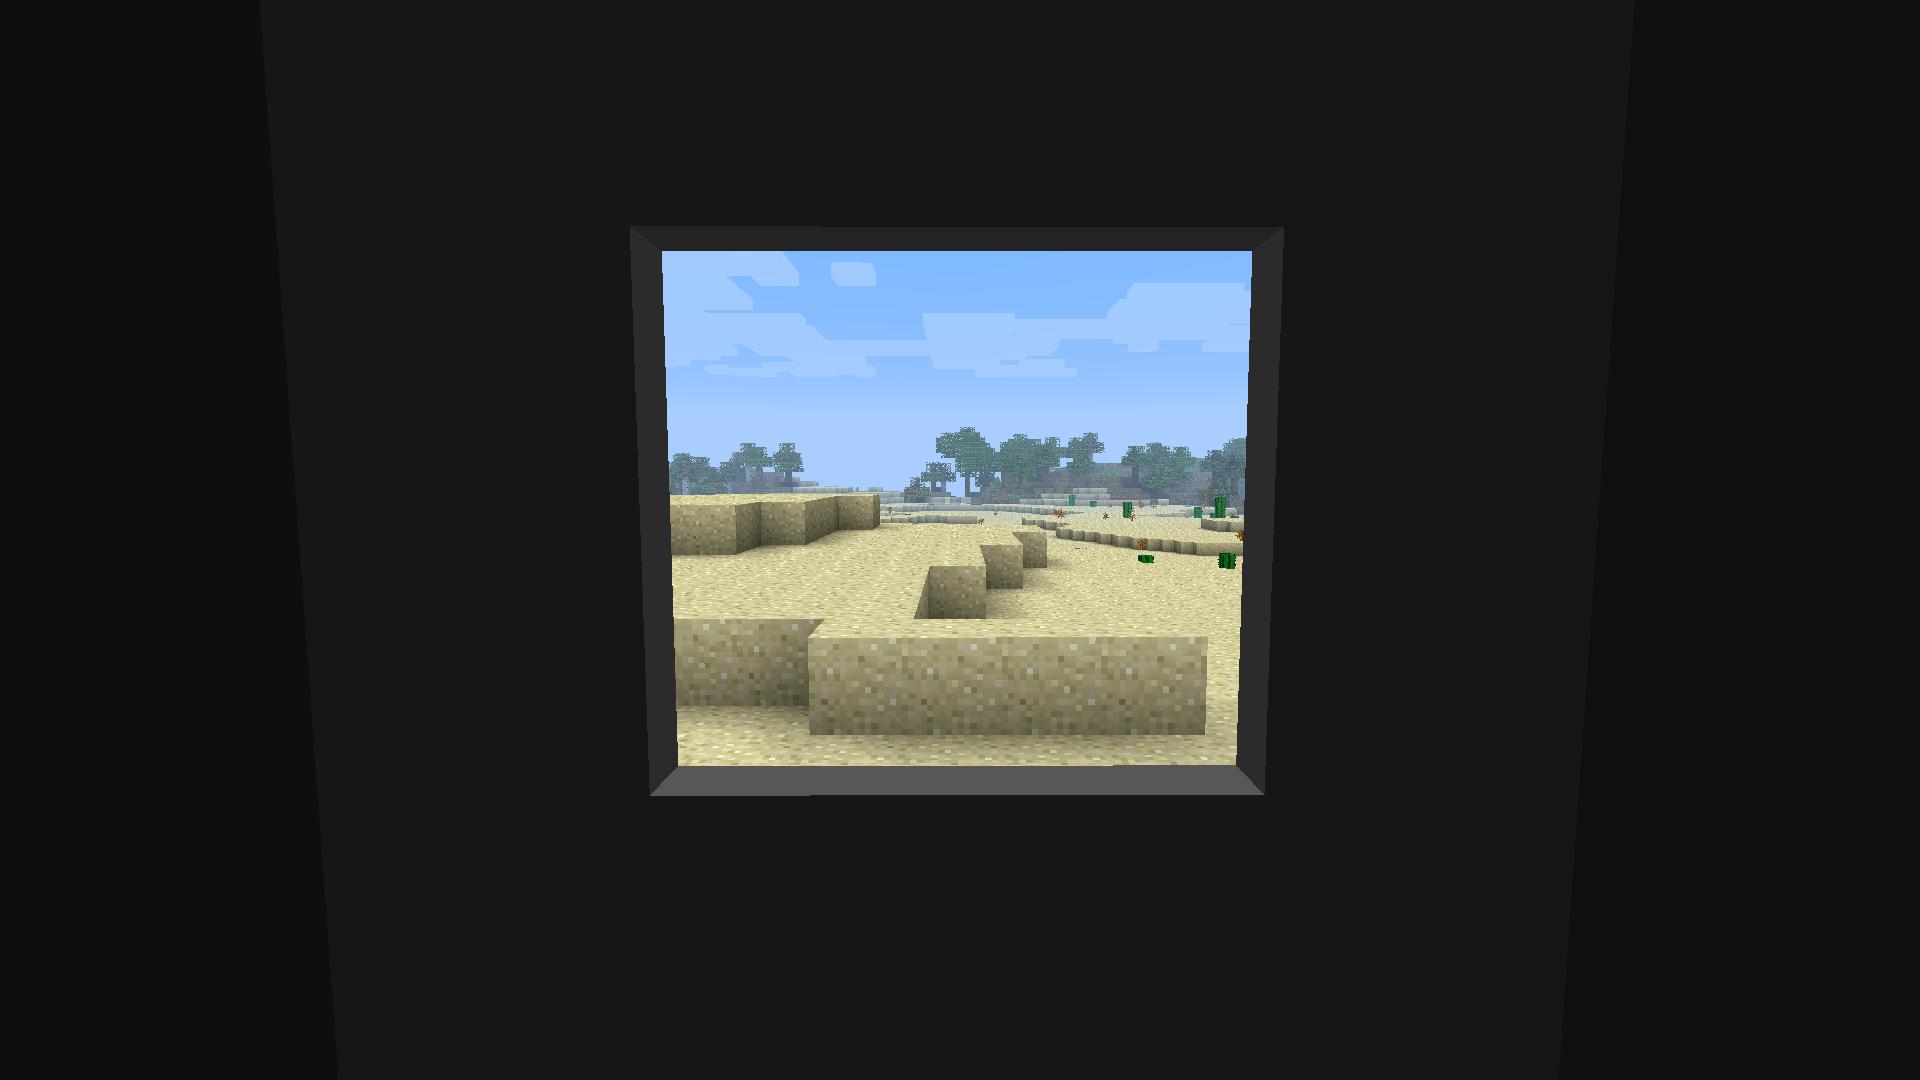 e468c  Galacticraft Mod 2 Galacticraft Screenshots